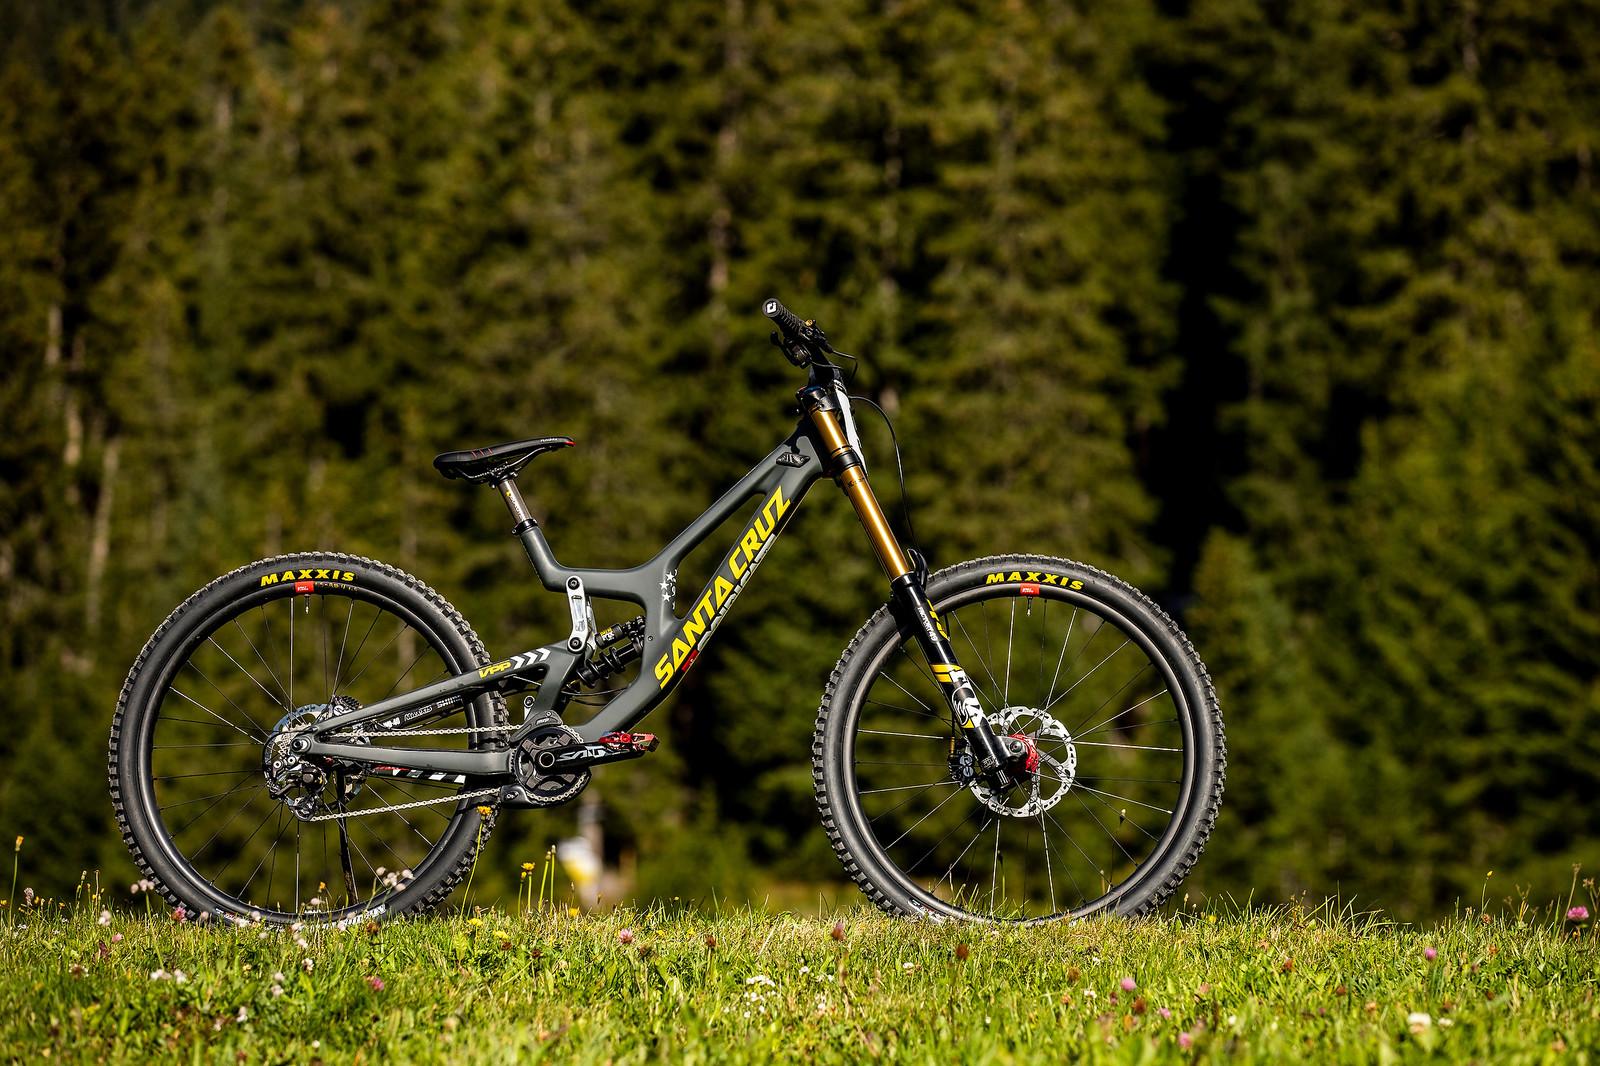 Under the Radar - Luca Shaw's Santa Cruz V10 World Champs Bike - WORLD CHAMPS BIKE - Luca Shaw's Santa Cruz V10 - Mountain Biking Pictures - Vital MTB